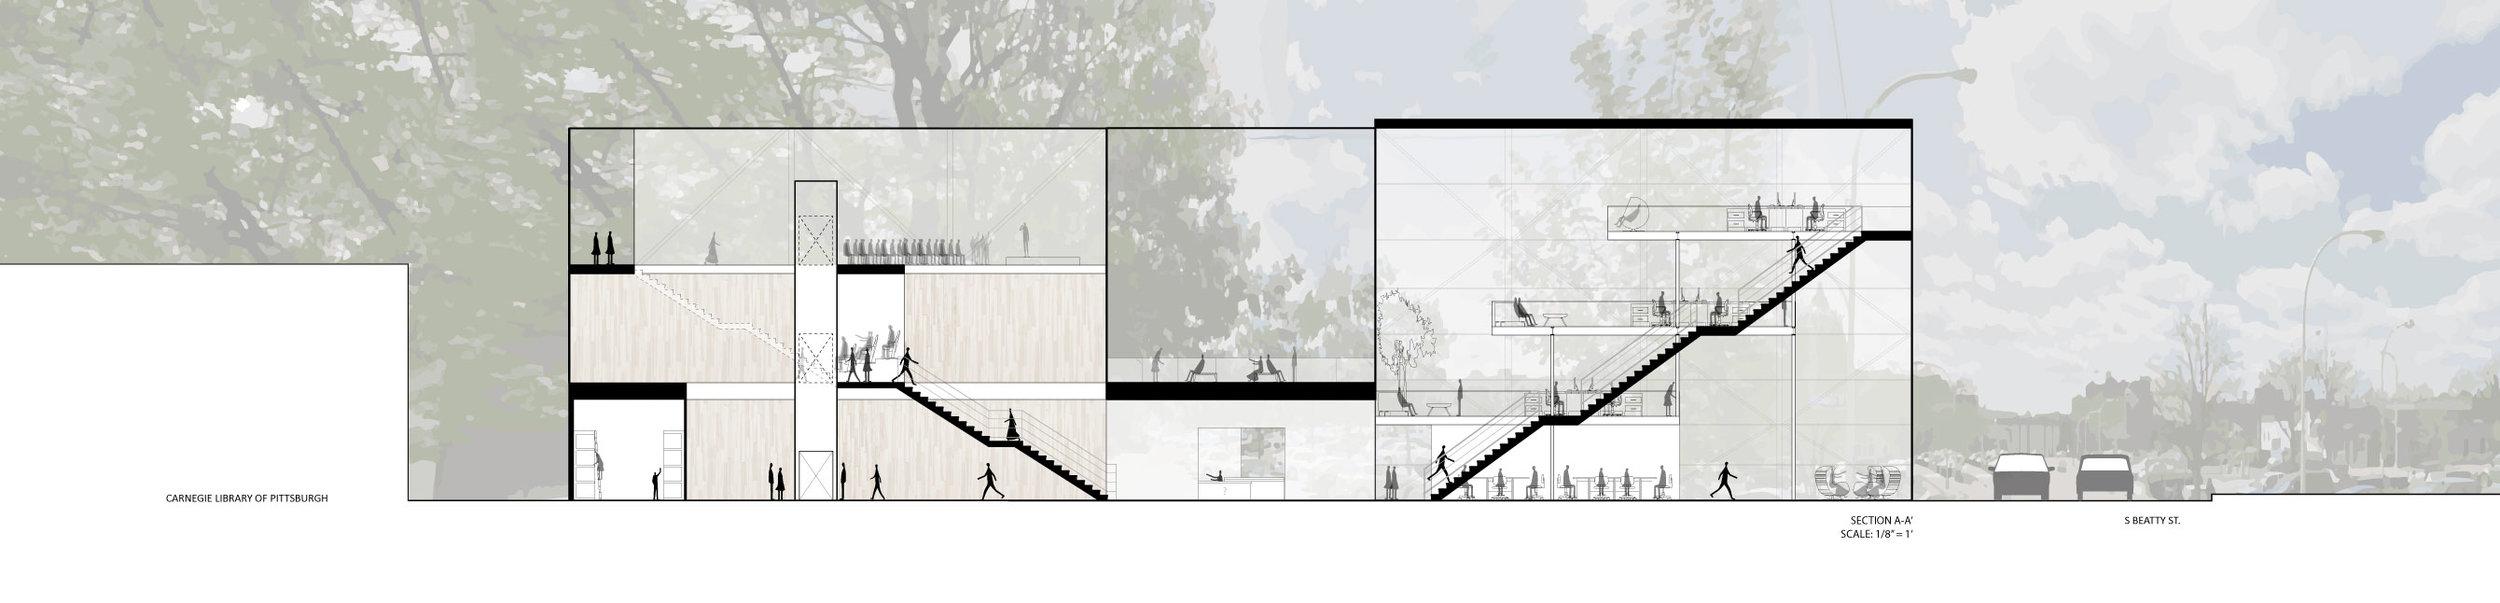 5-5-Section.jpg